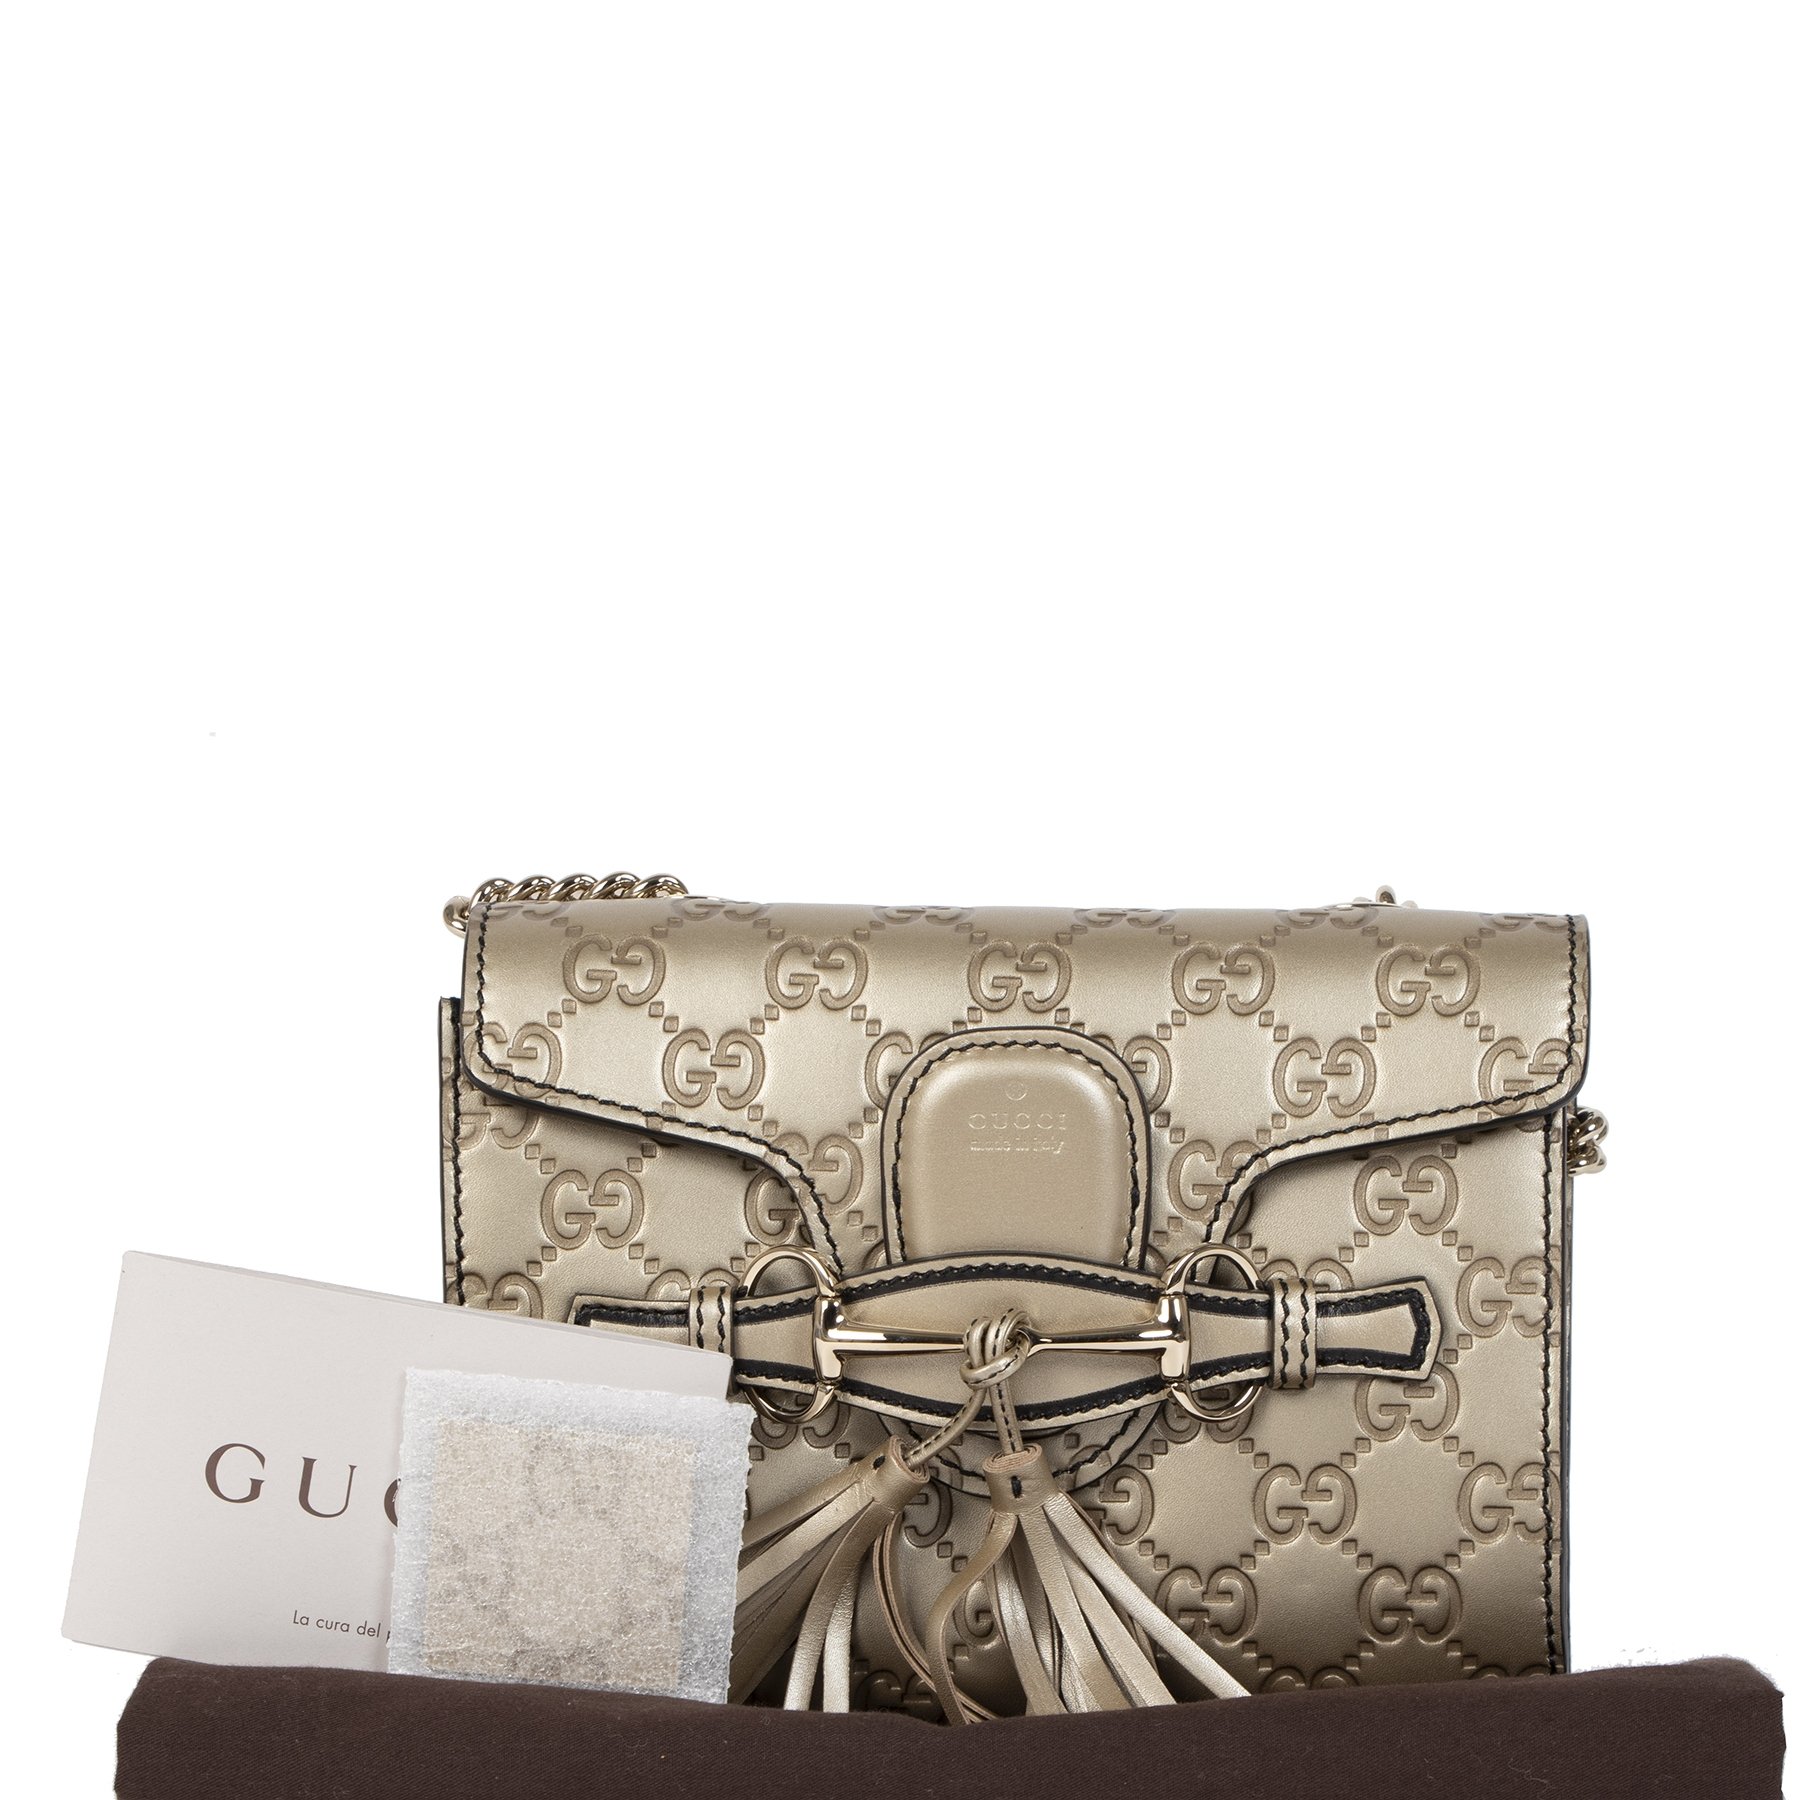 Authentieke tweedehands vintage Gucci Emily Guccissima Bronze Crossbody Bag koop online webshop LabelLOV